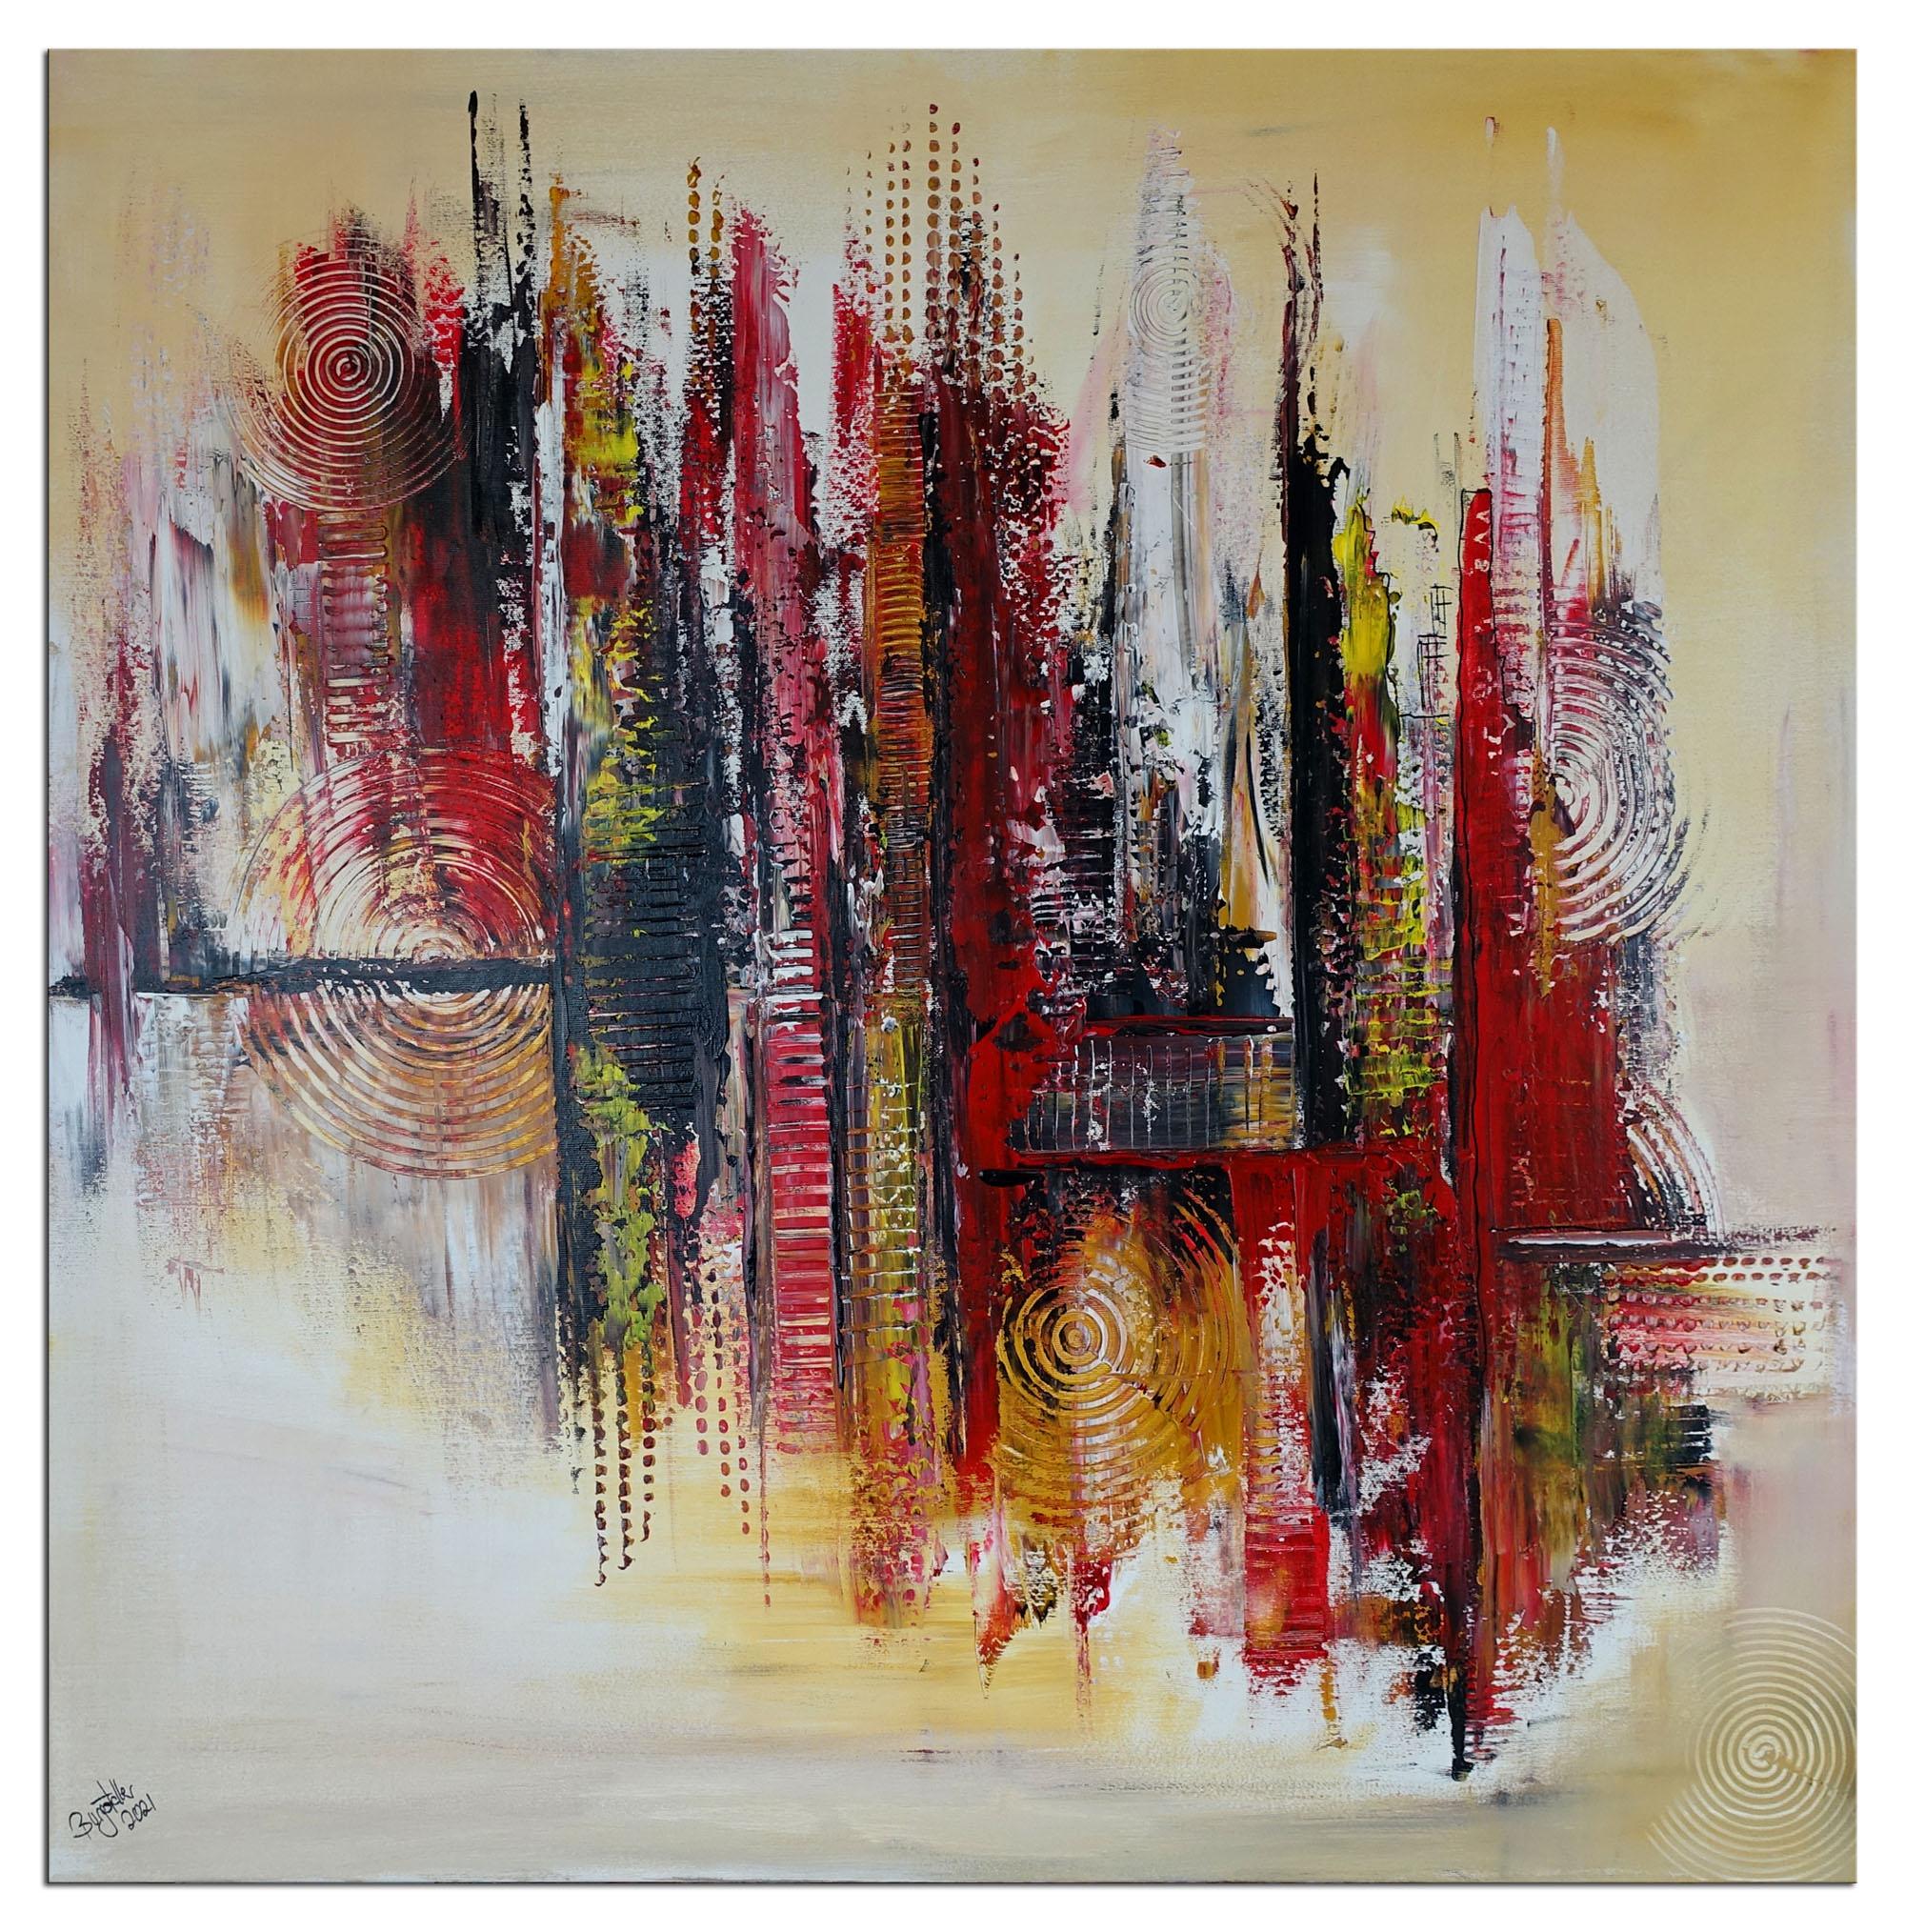 Feuerwalze xxl abstraktes Acrylbild Leinwandbild gemalt Unikat Original Gemälde rot gelb 70x120